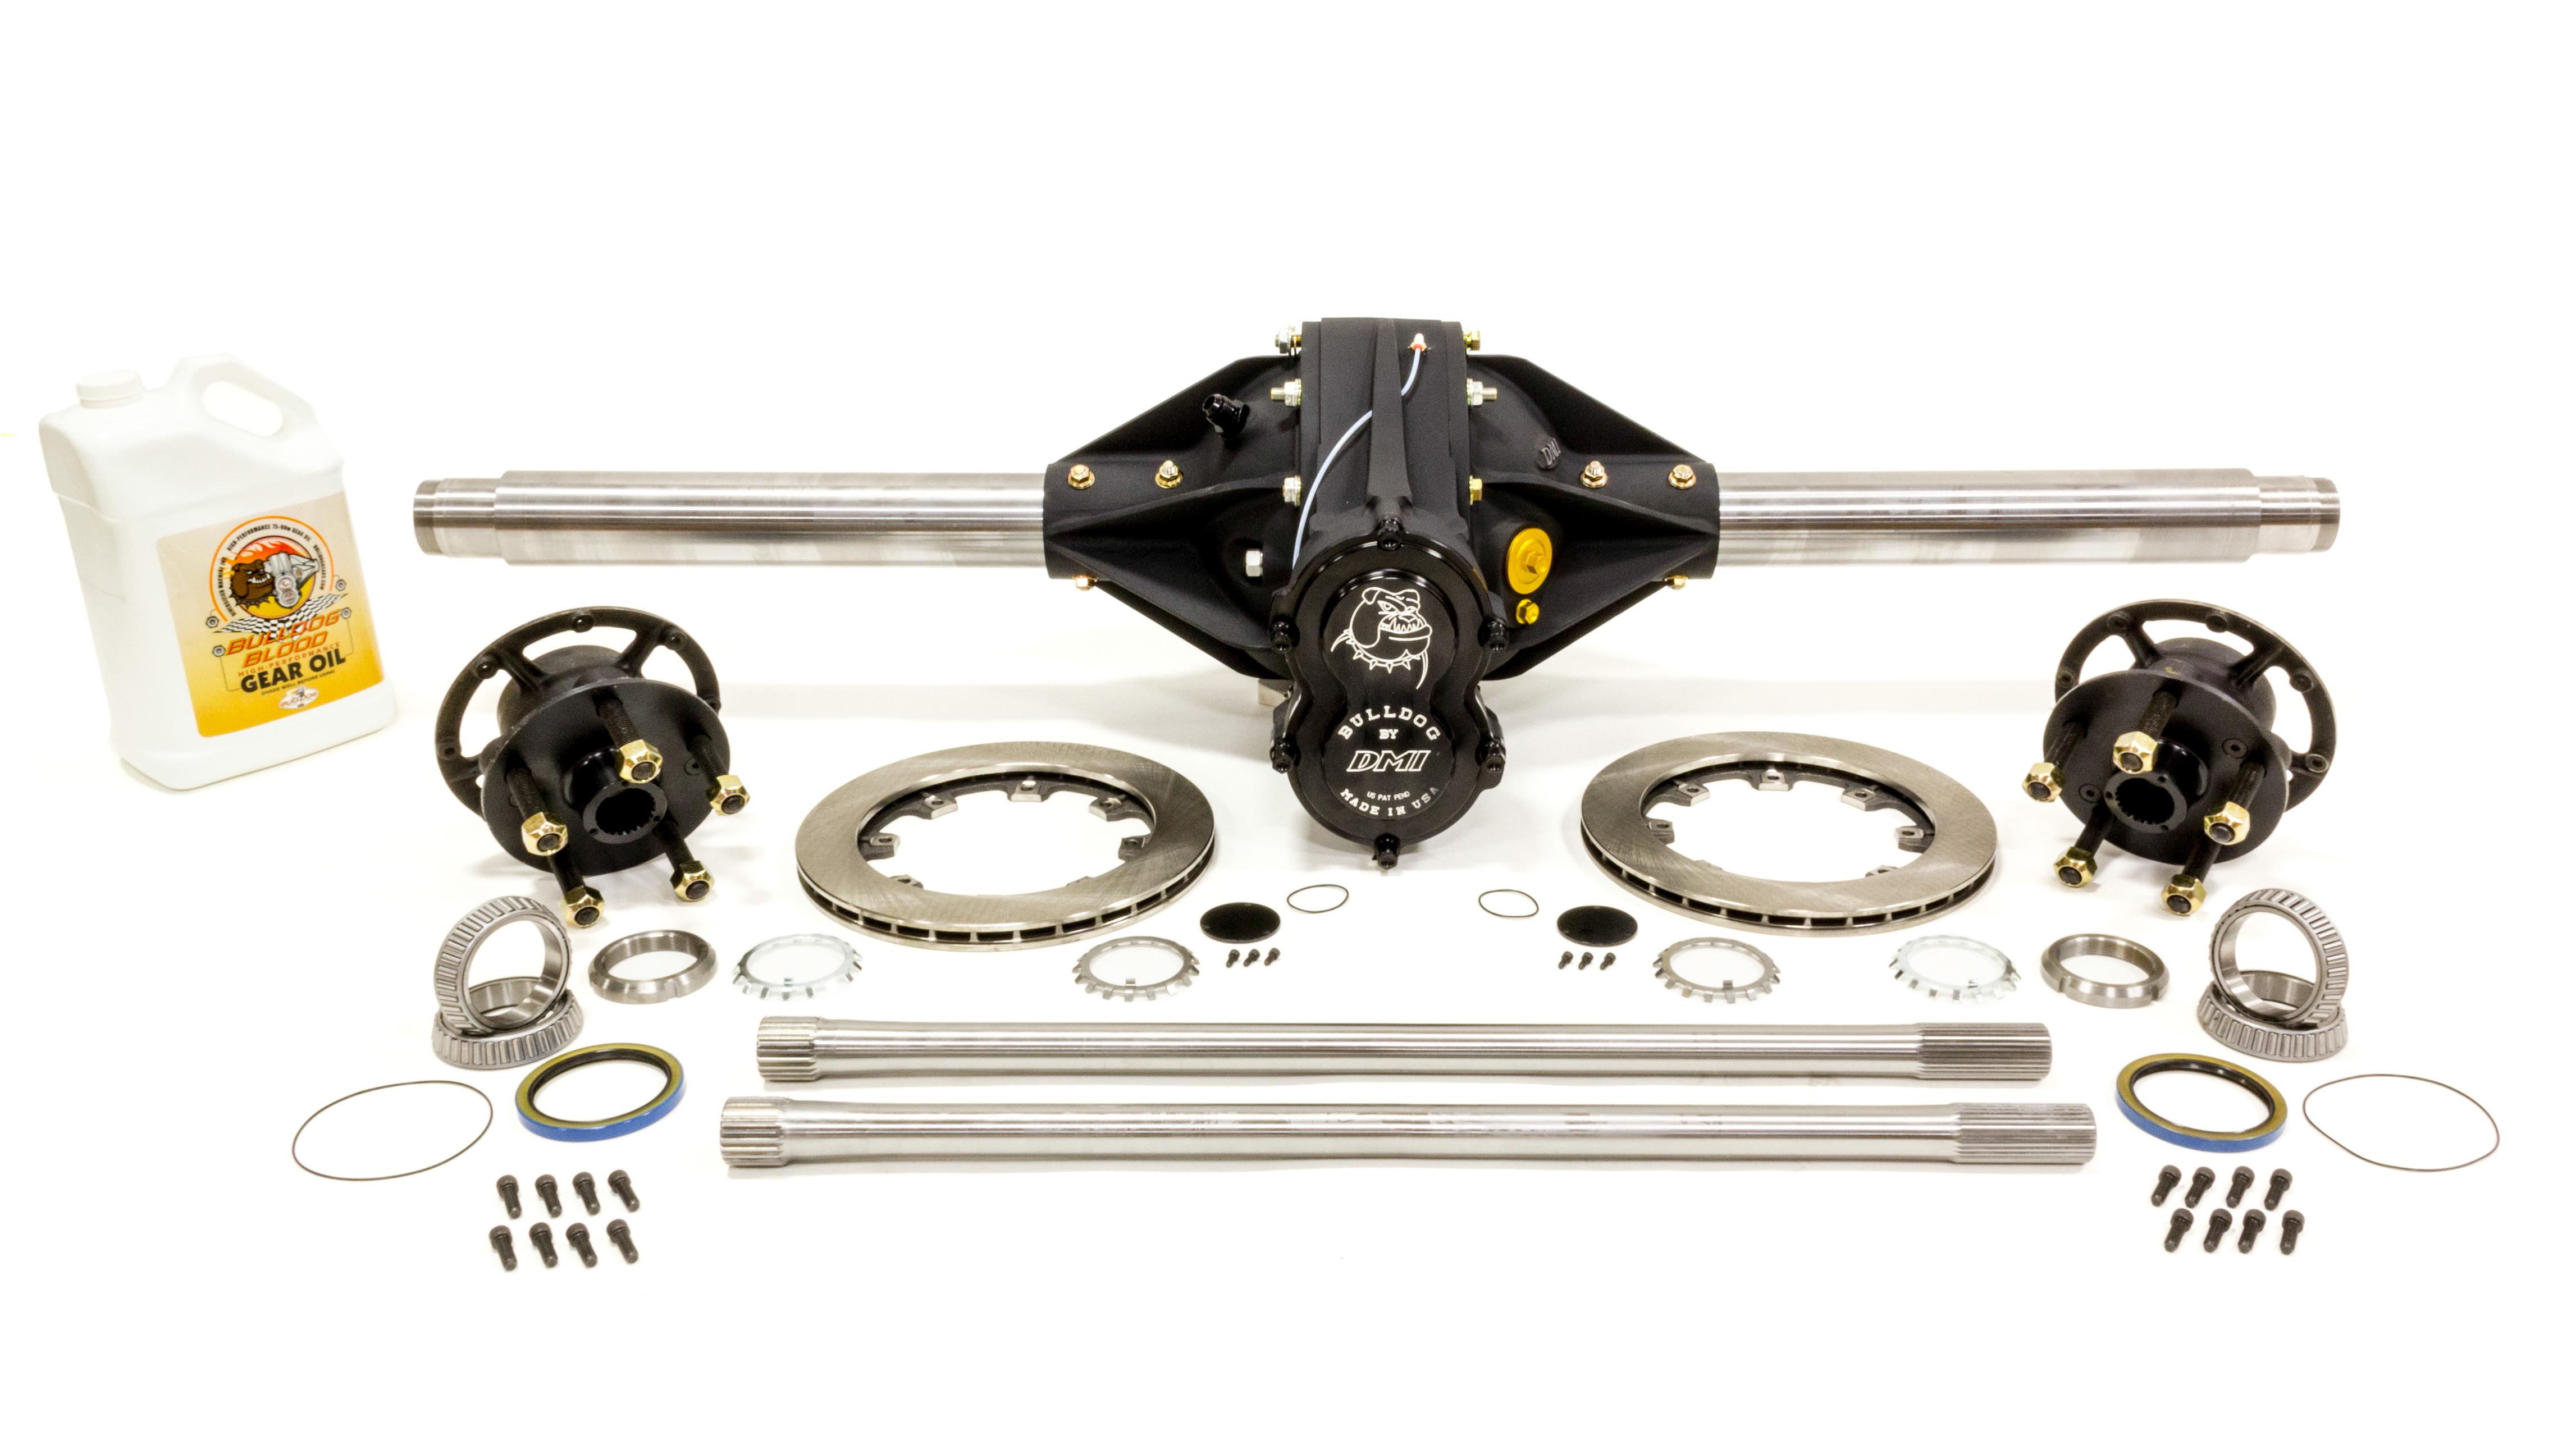 Diversified Machine Q/C Rearend Pro 4.86 w/ Tubes Hubs Rotors Hollow